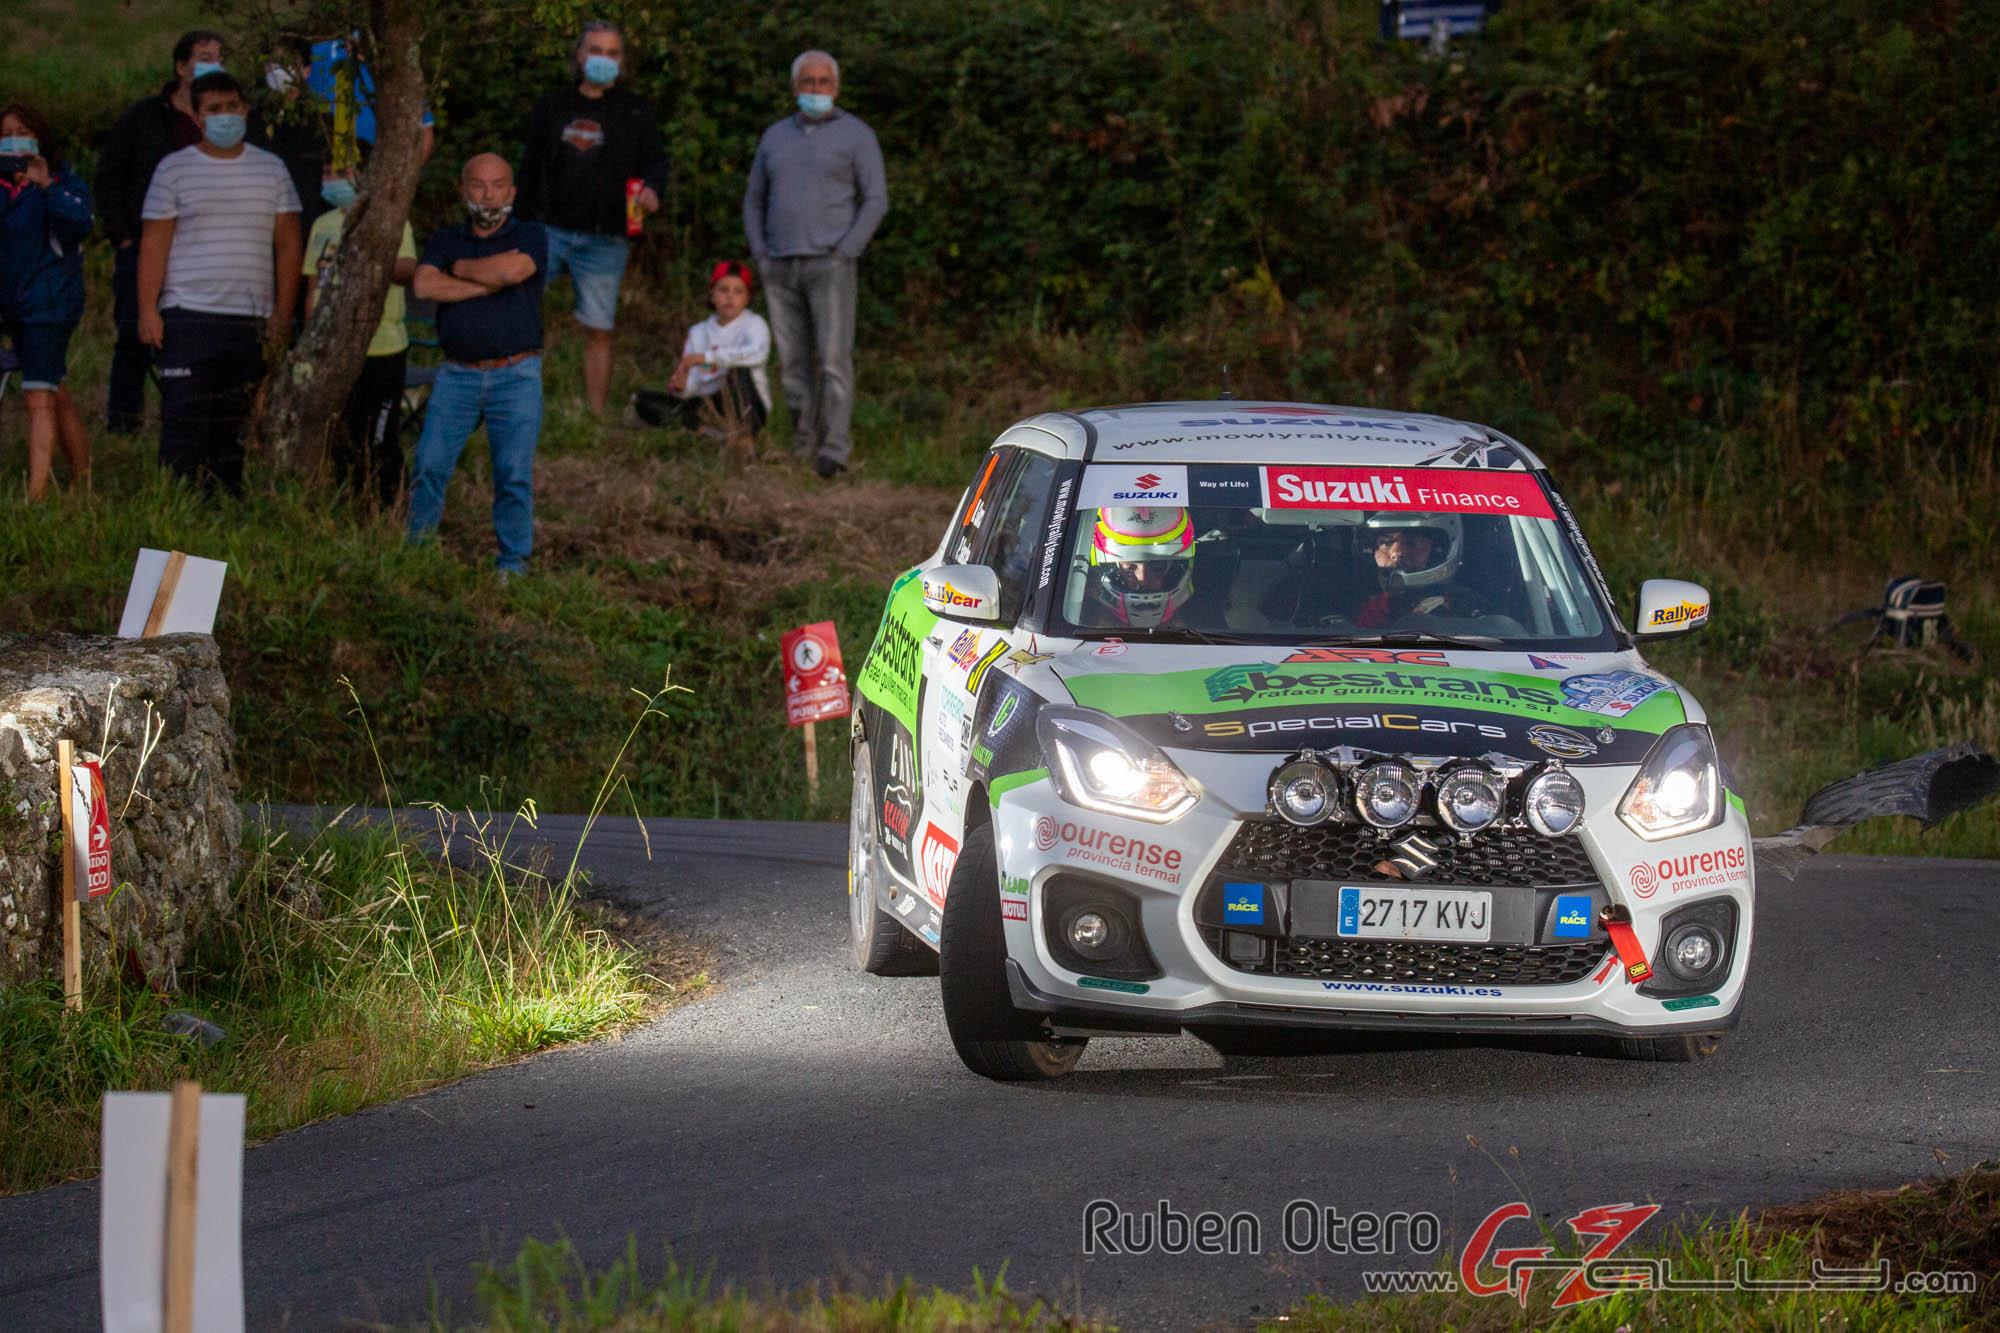 Rally de Ferrol 2020 - Ruben Otero